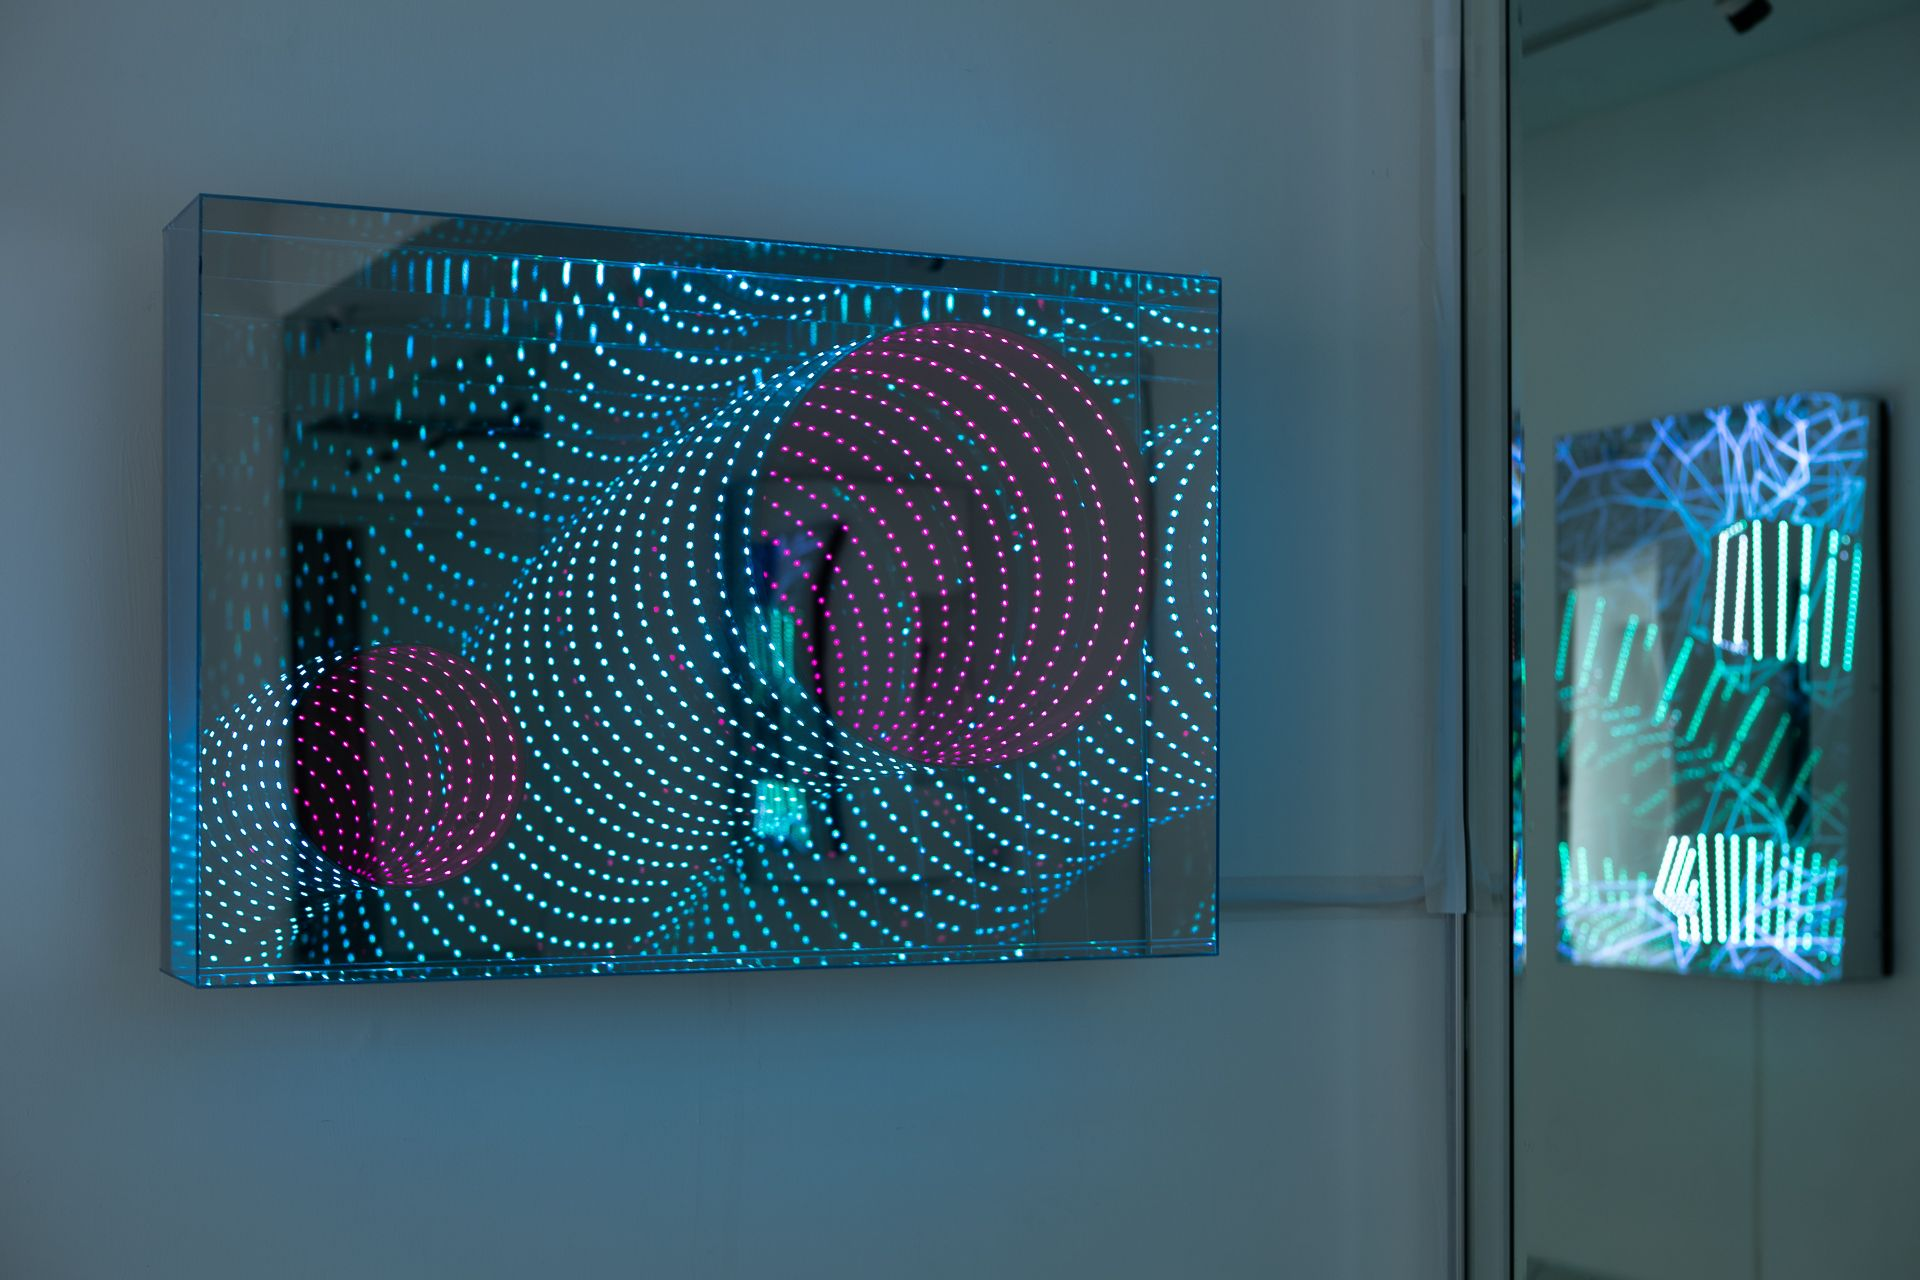 Bluerider ART漢斯卡特個展「Beyond Light 光徑」。(圖Bluerider ART提供)